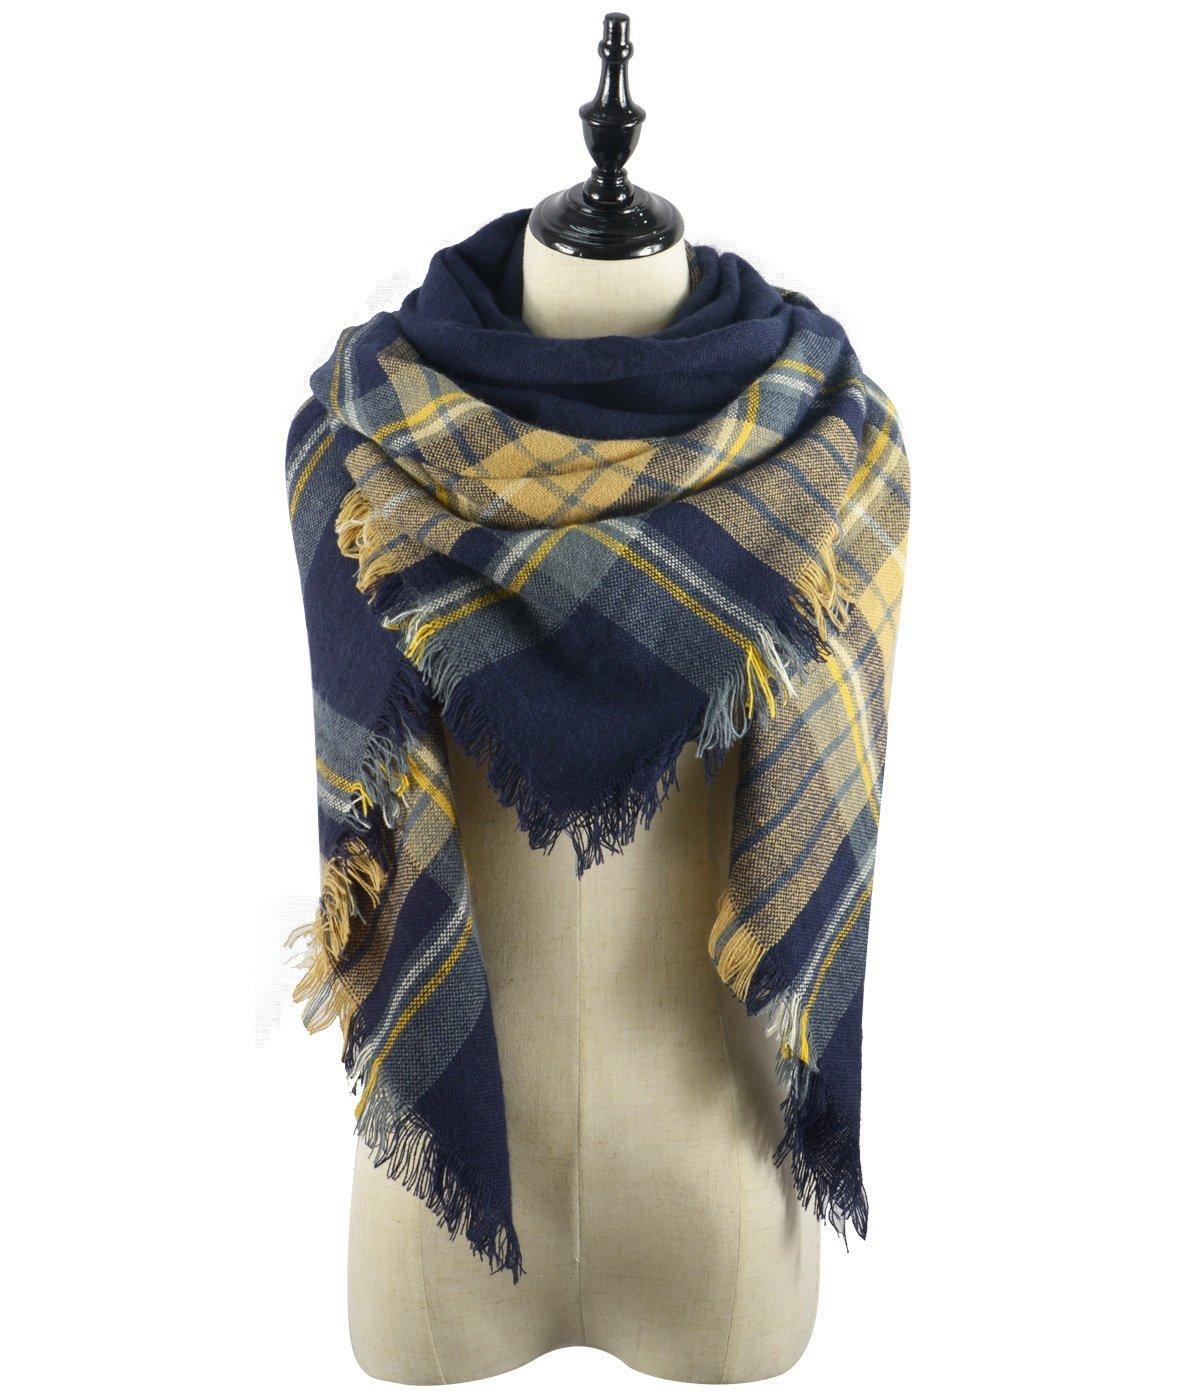 Women's Fall Winter Scarf Classic Tassel Plaid Scarf Warm Soft Chunky Large Blanket Wrap Shawl Scarves Yellow Navy